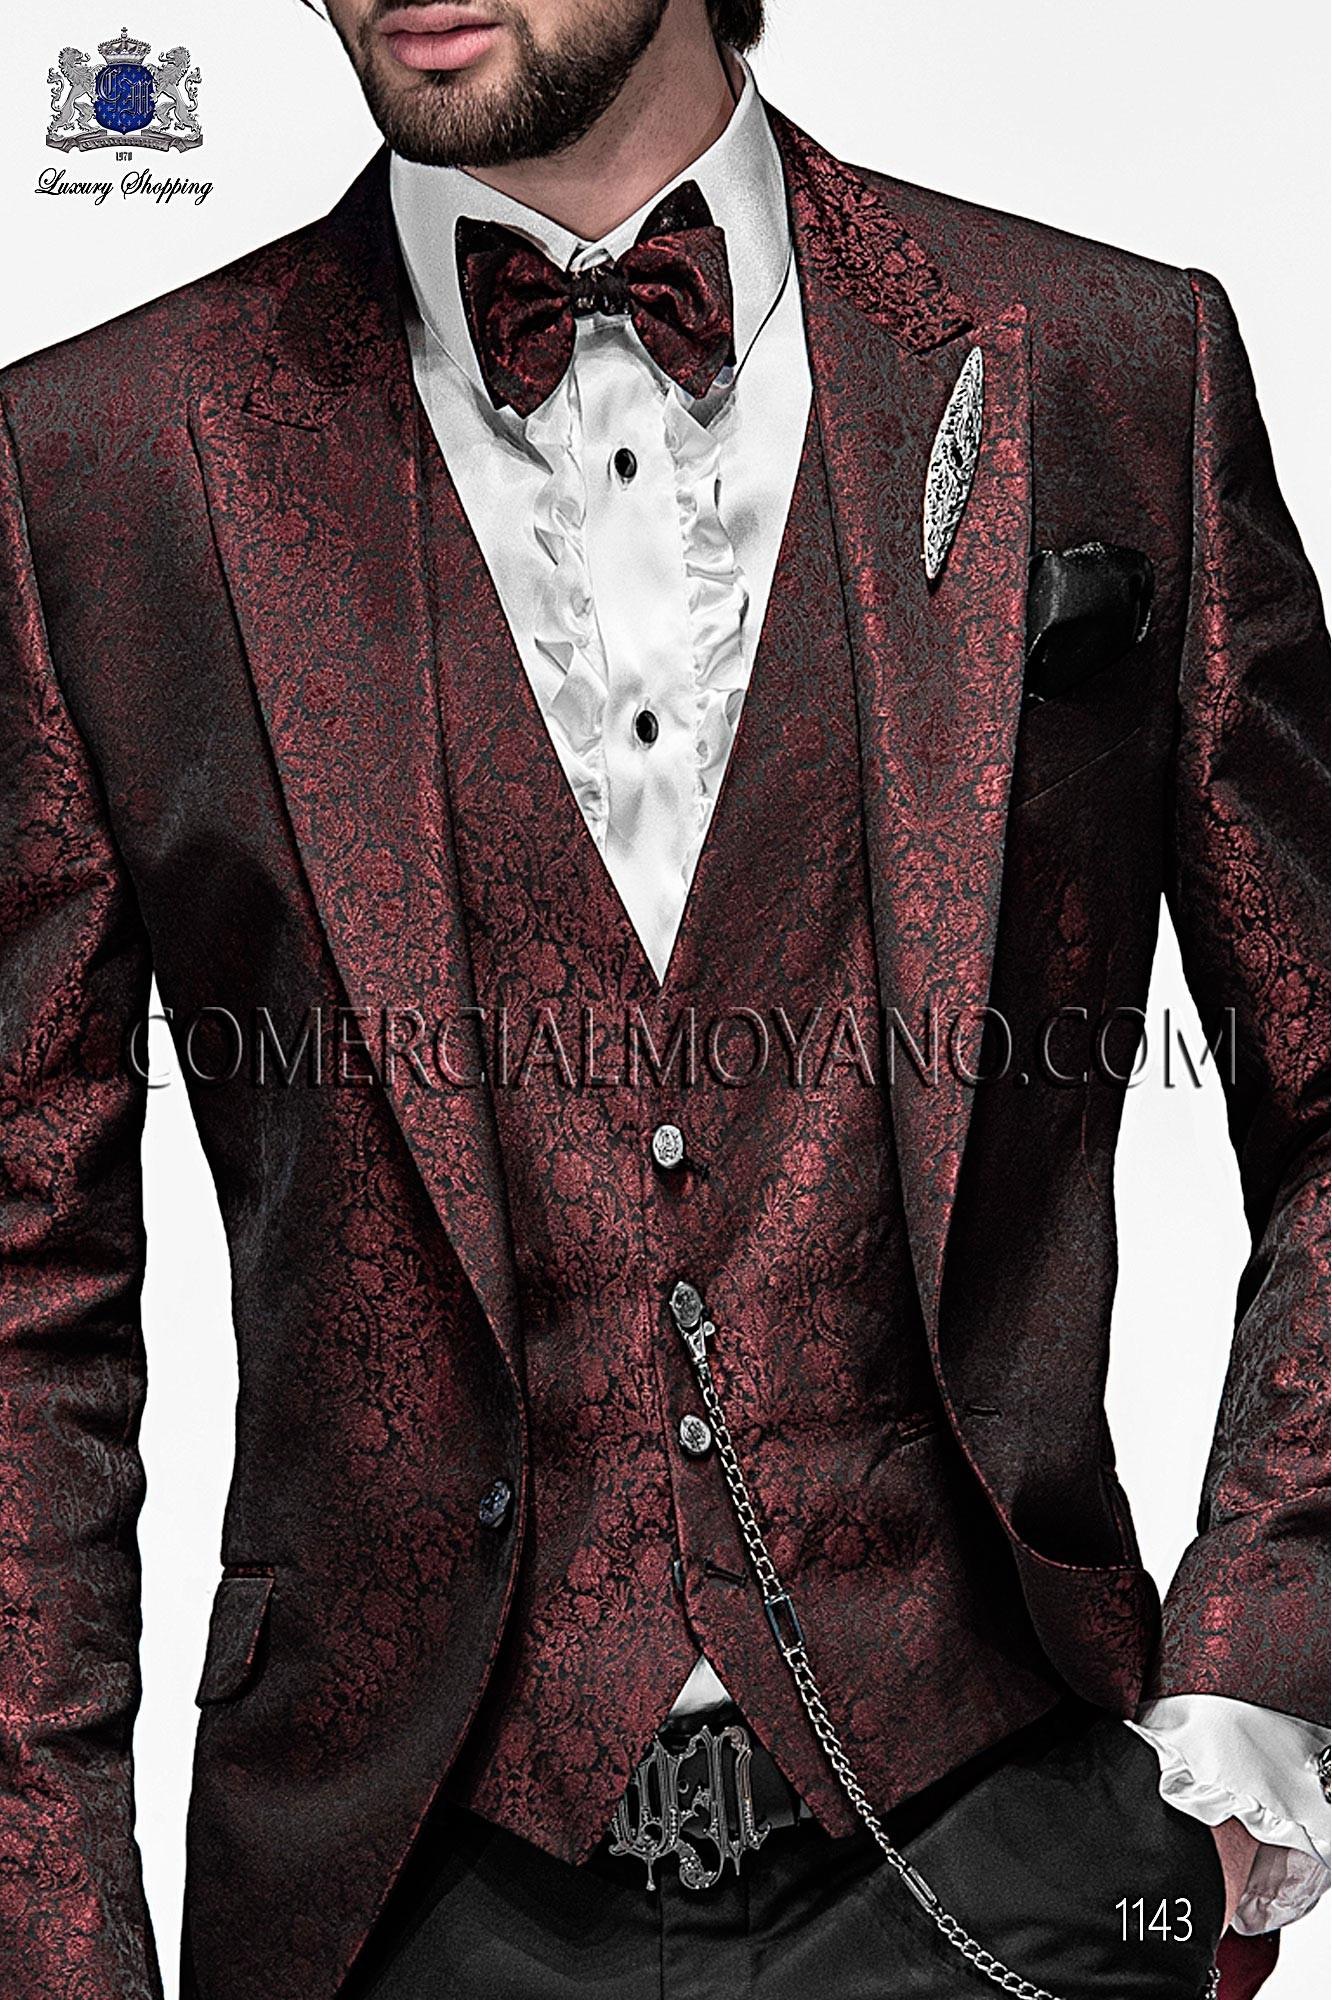 Italian emotion black and burgundy men wedding suit, model: 1143 Ottavio Nuccio Gala 2017 Emotion Collection